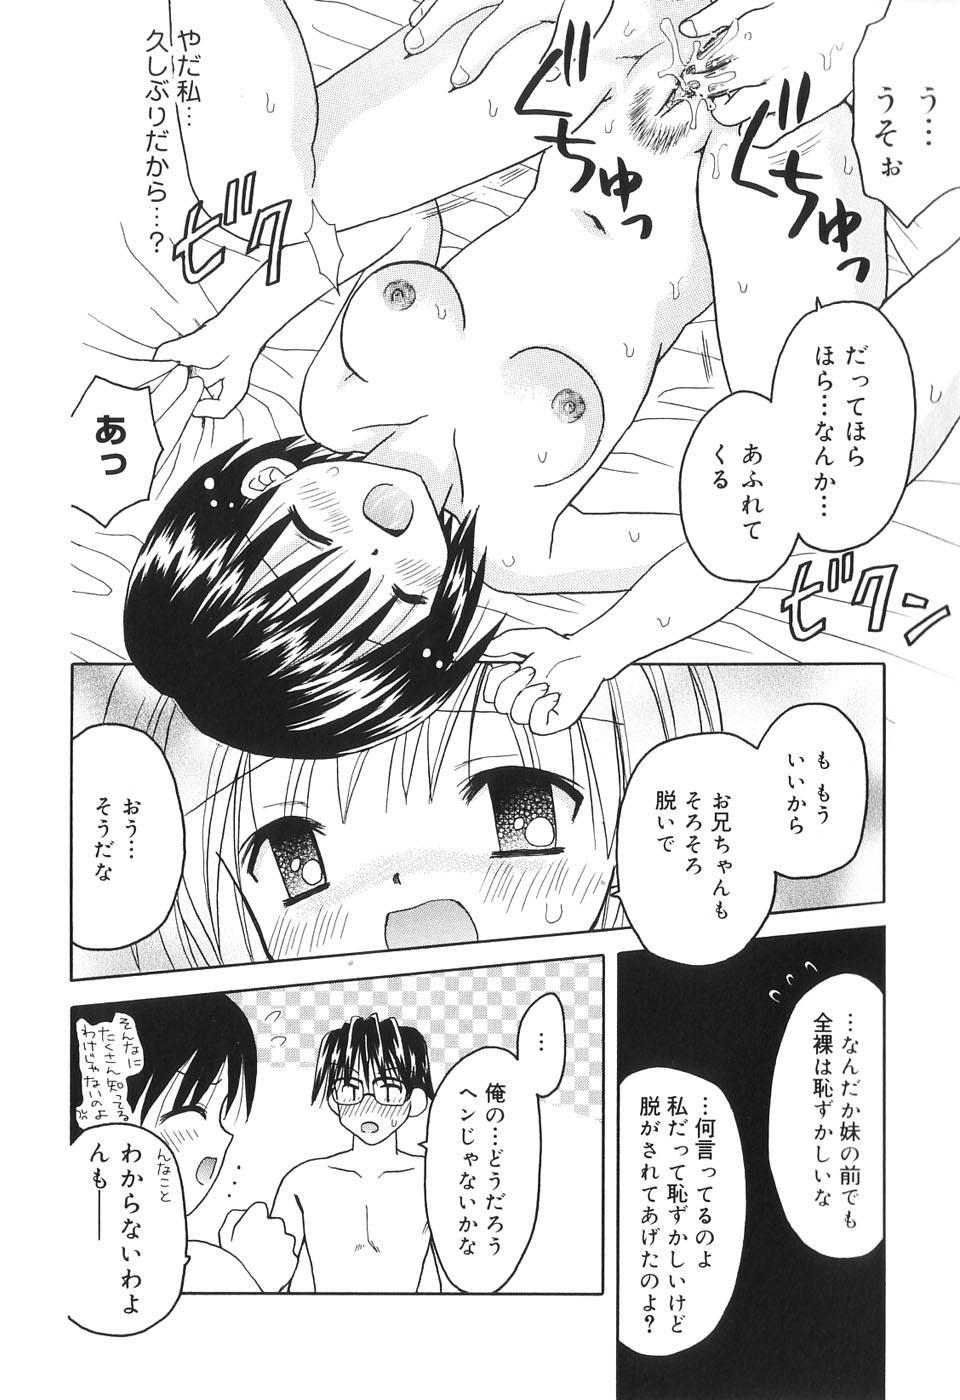 Musoubana 116